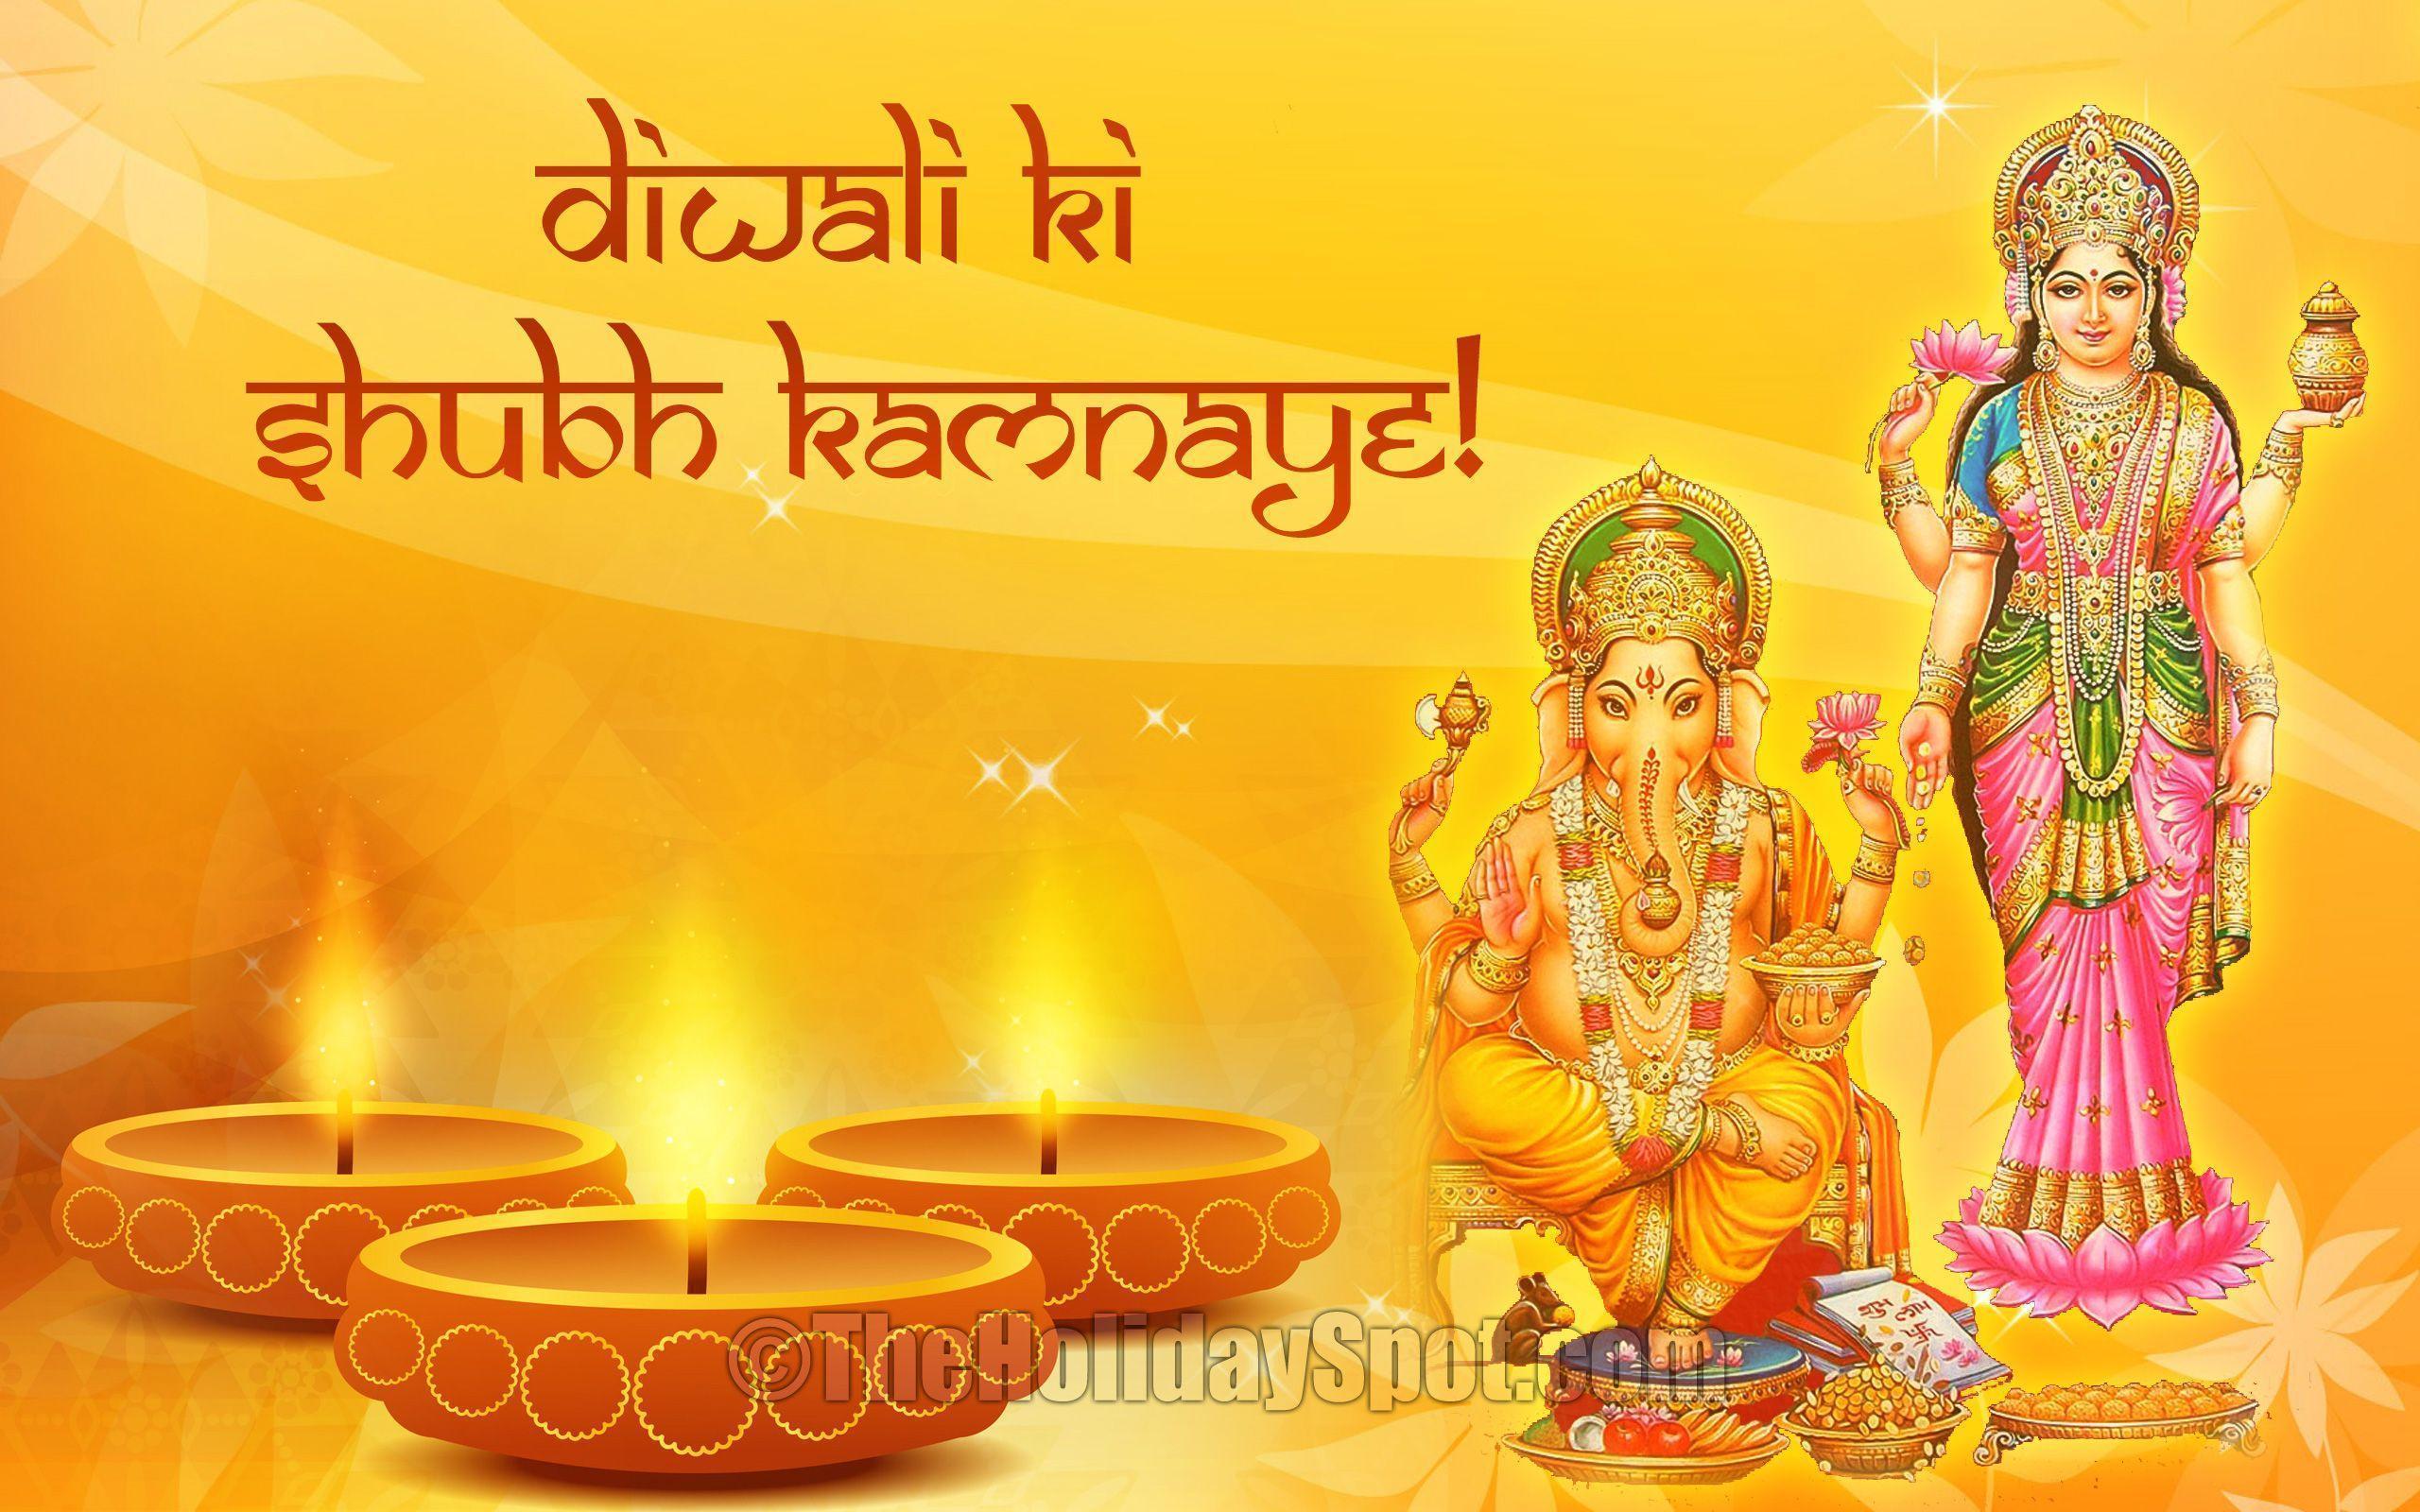 Happy Diwali Wallpapers - TheHolidaySpot